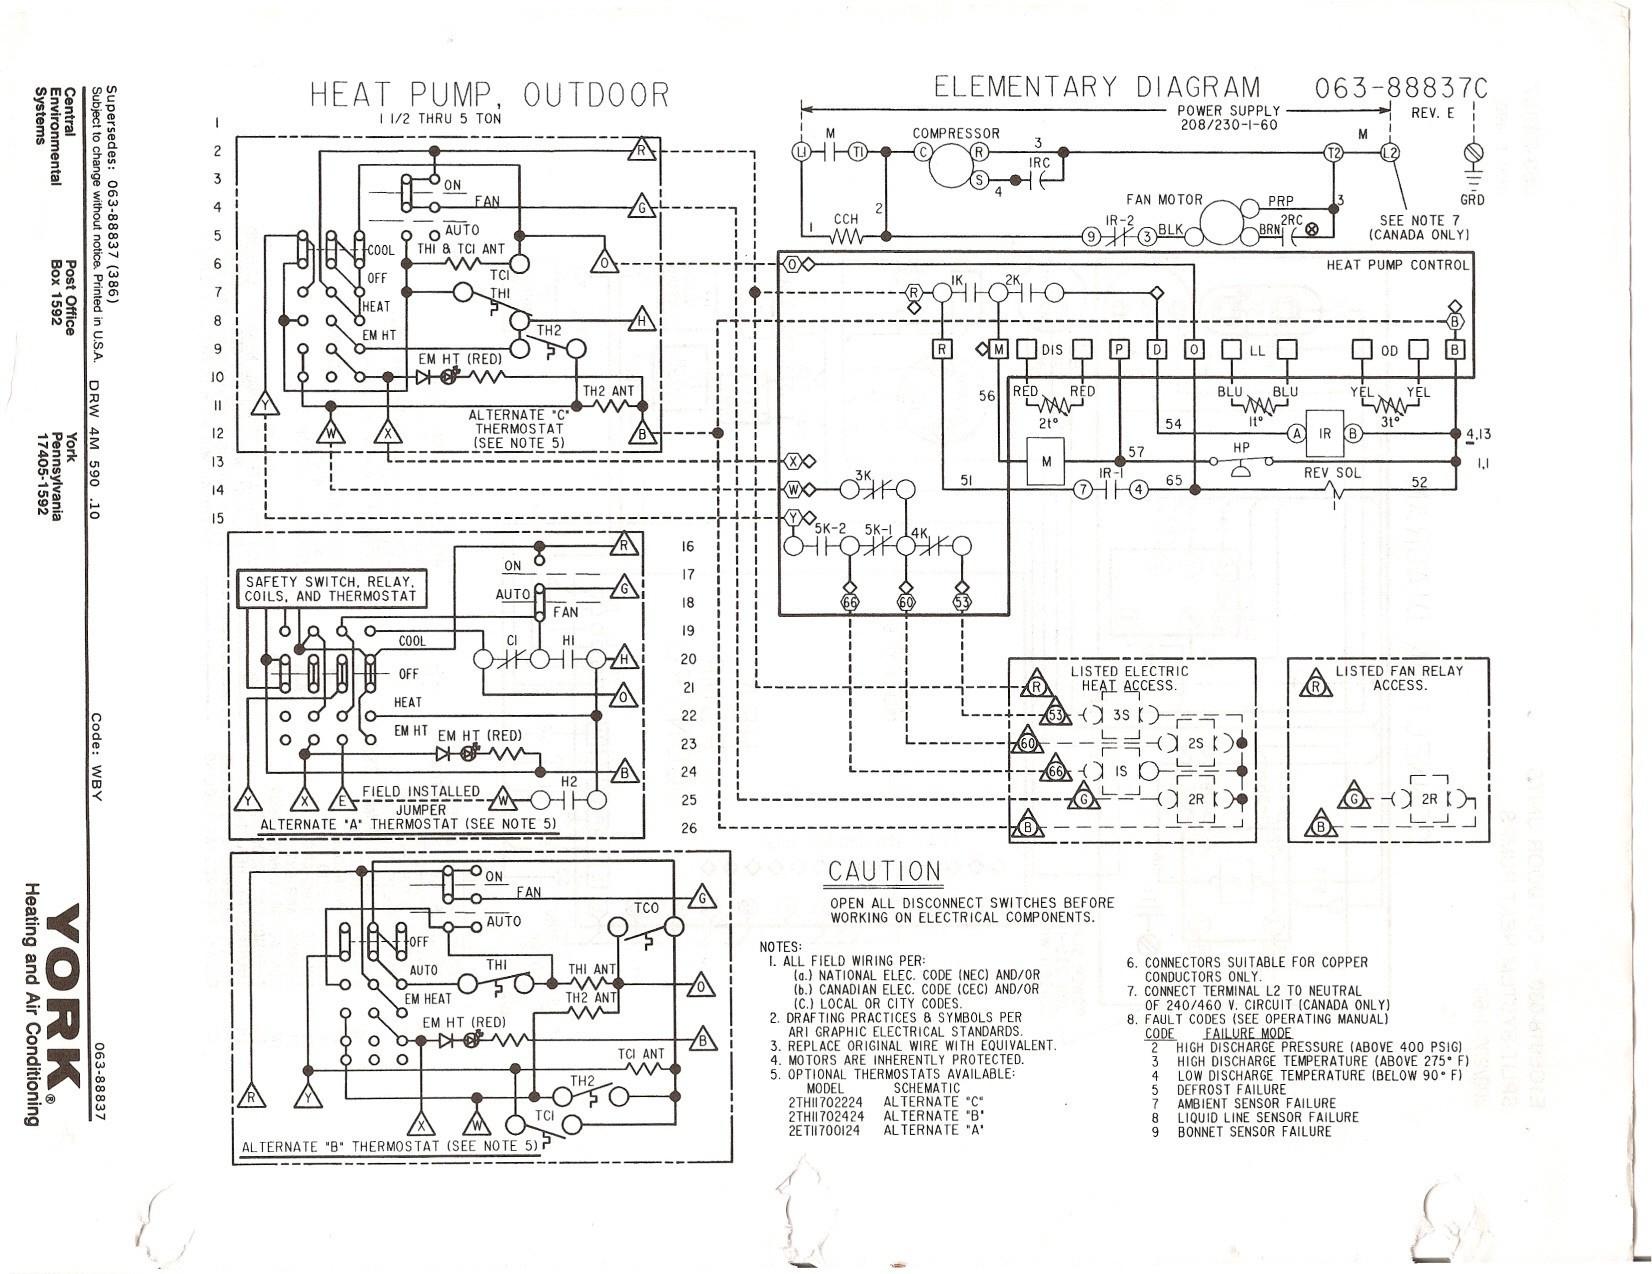 York Heat Pump Wiring Diagrams - Data Wiring Diagram Schematic - Heat Pump Wiring Diagram Schematic